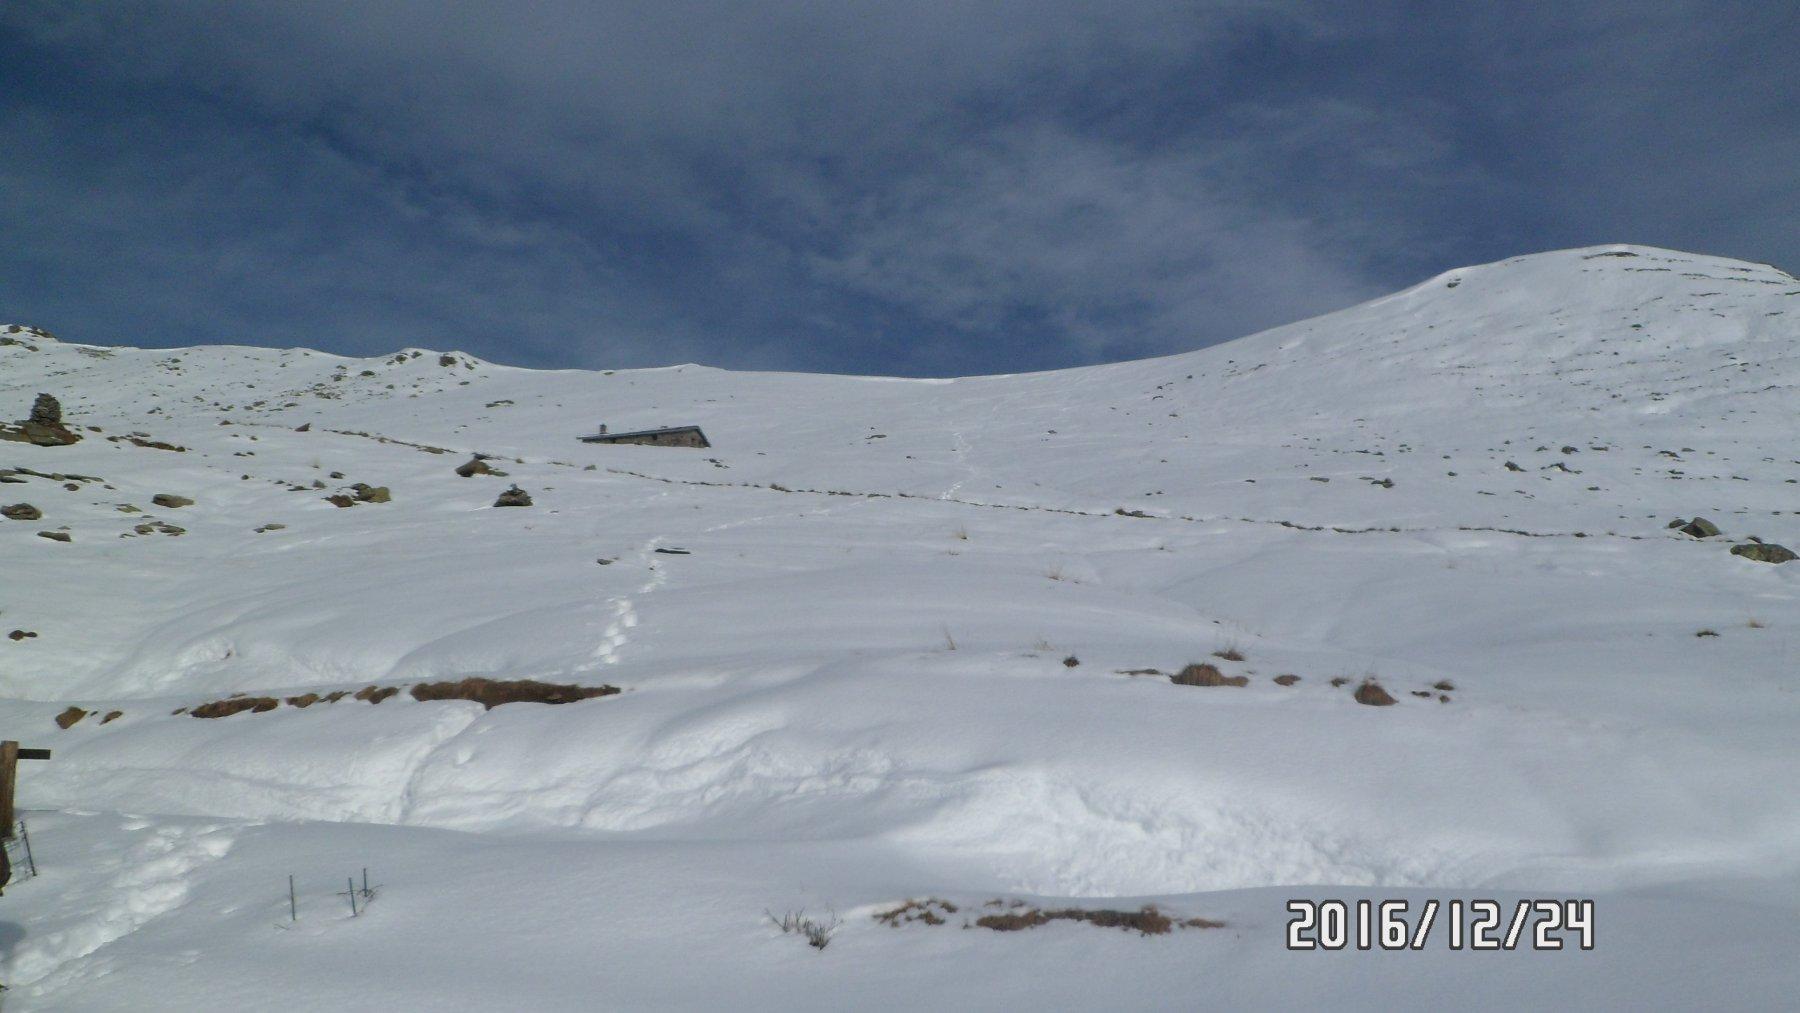 Dal rifugio Alpe Soglia